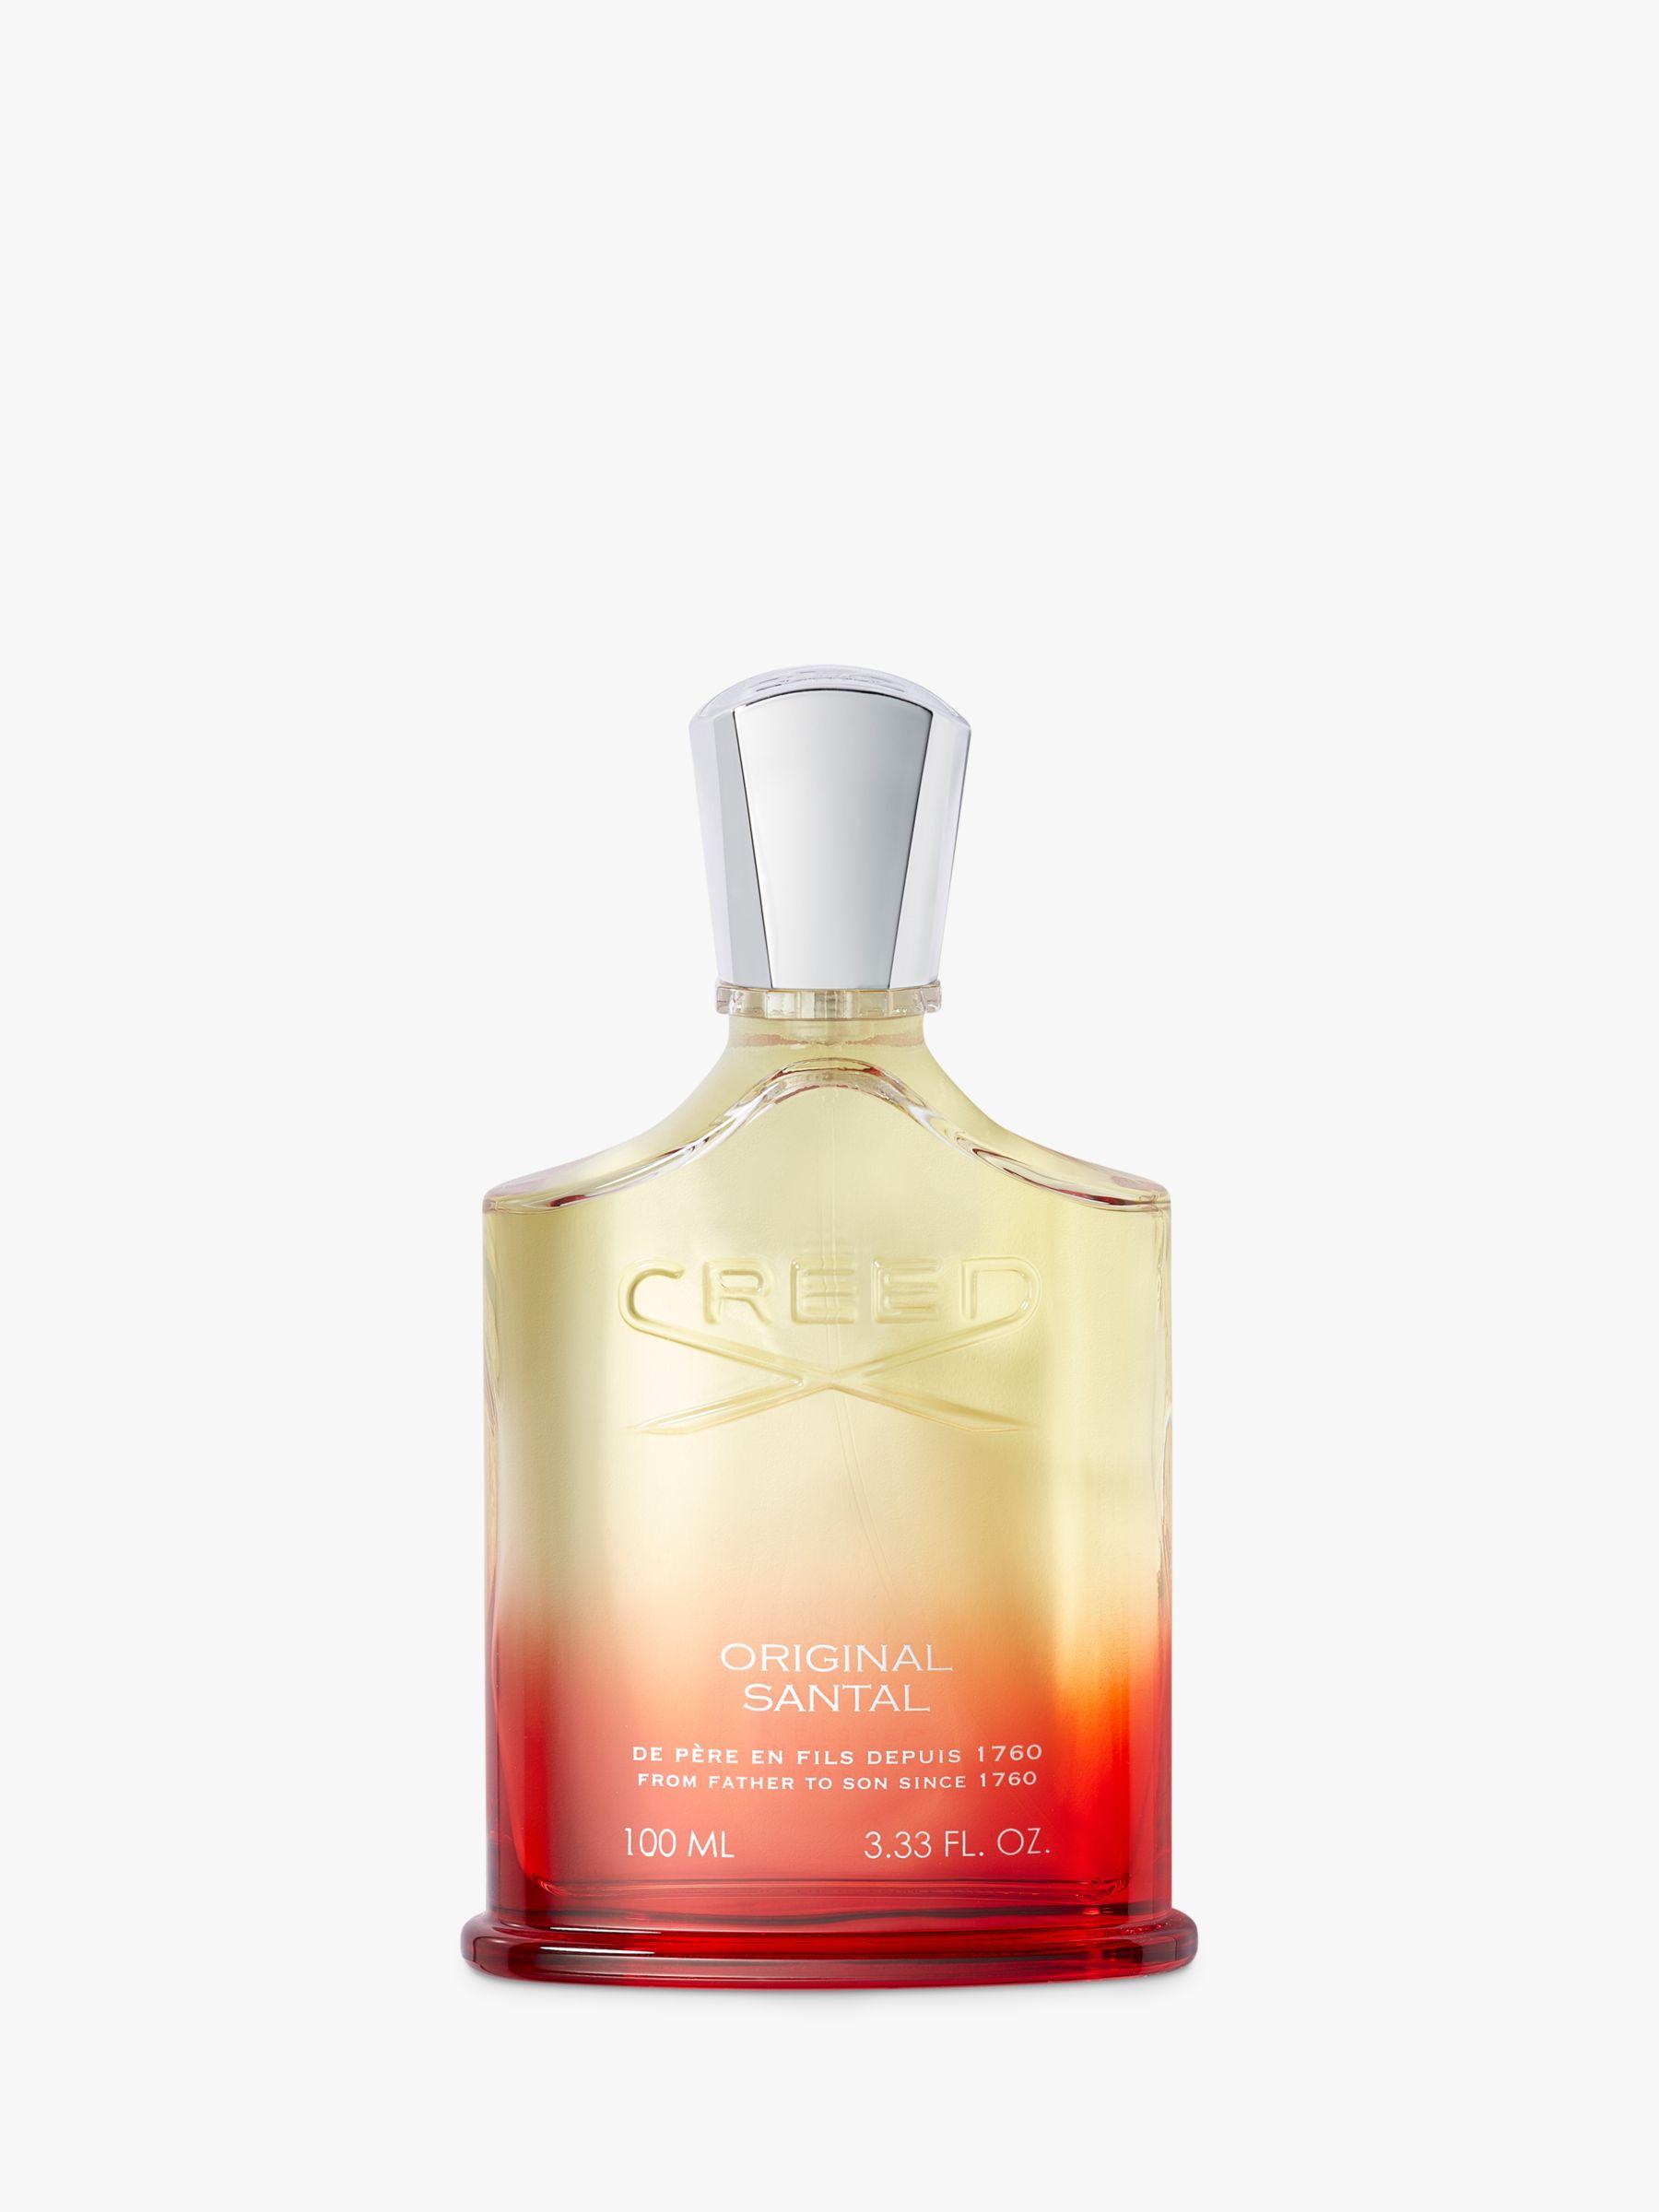 Creed CREED Original Santal Eau de Parfum, 100ml